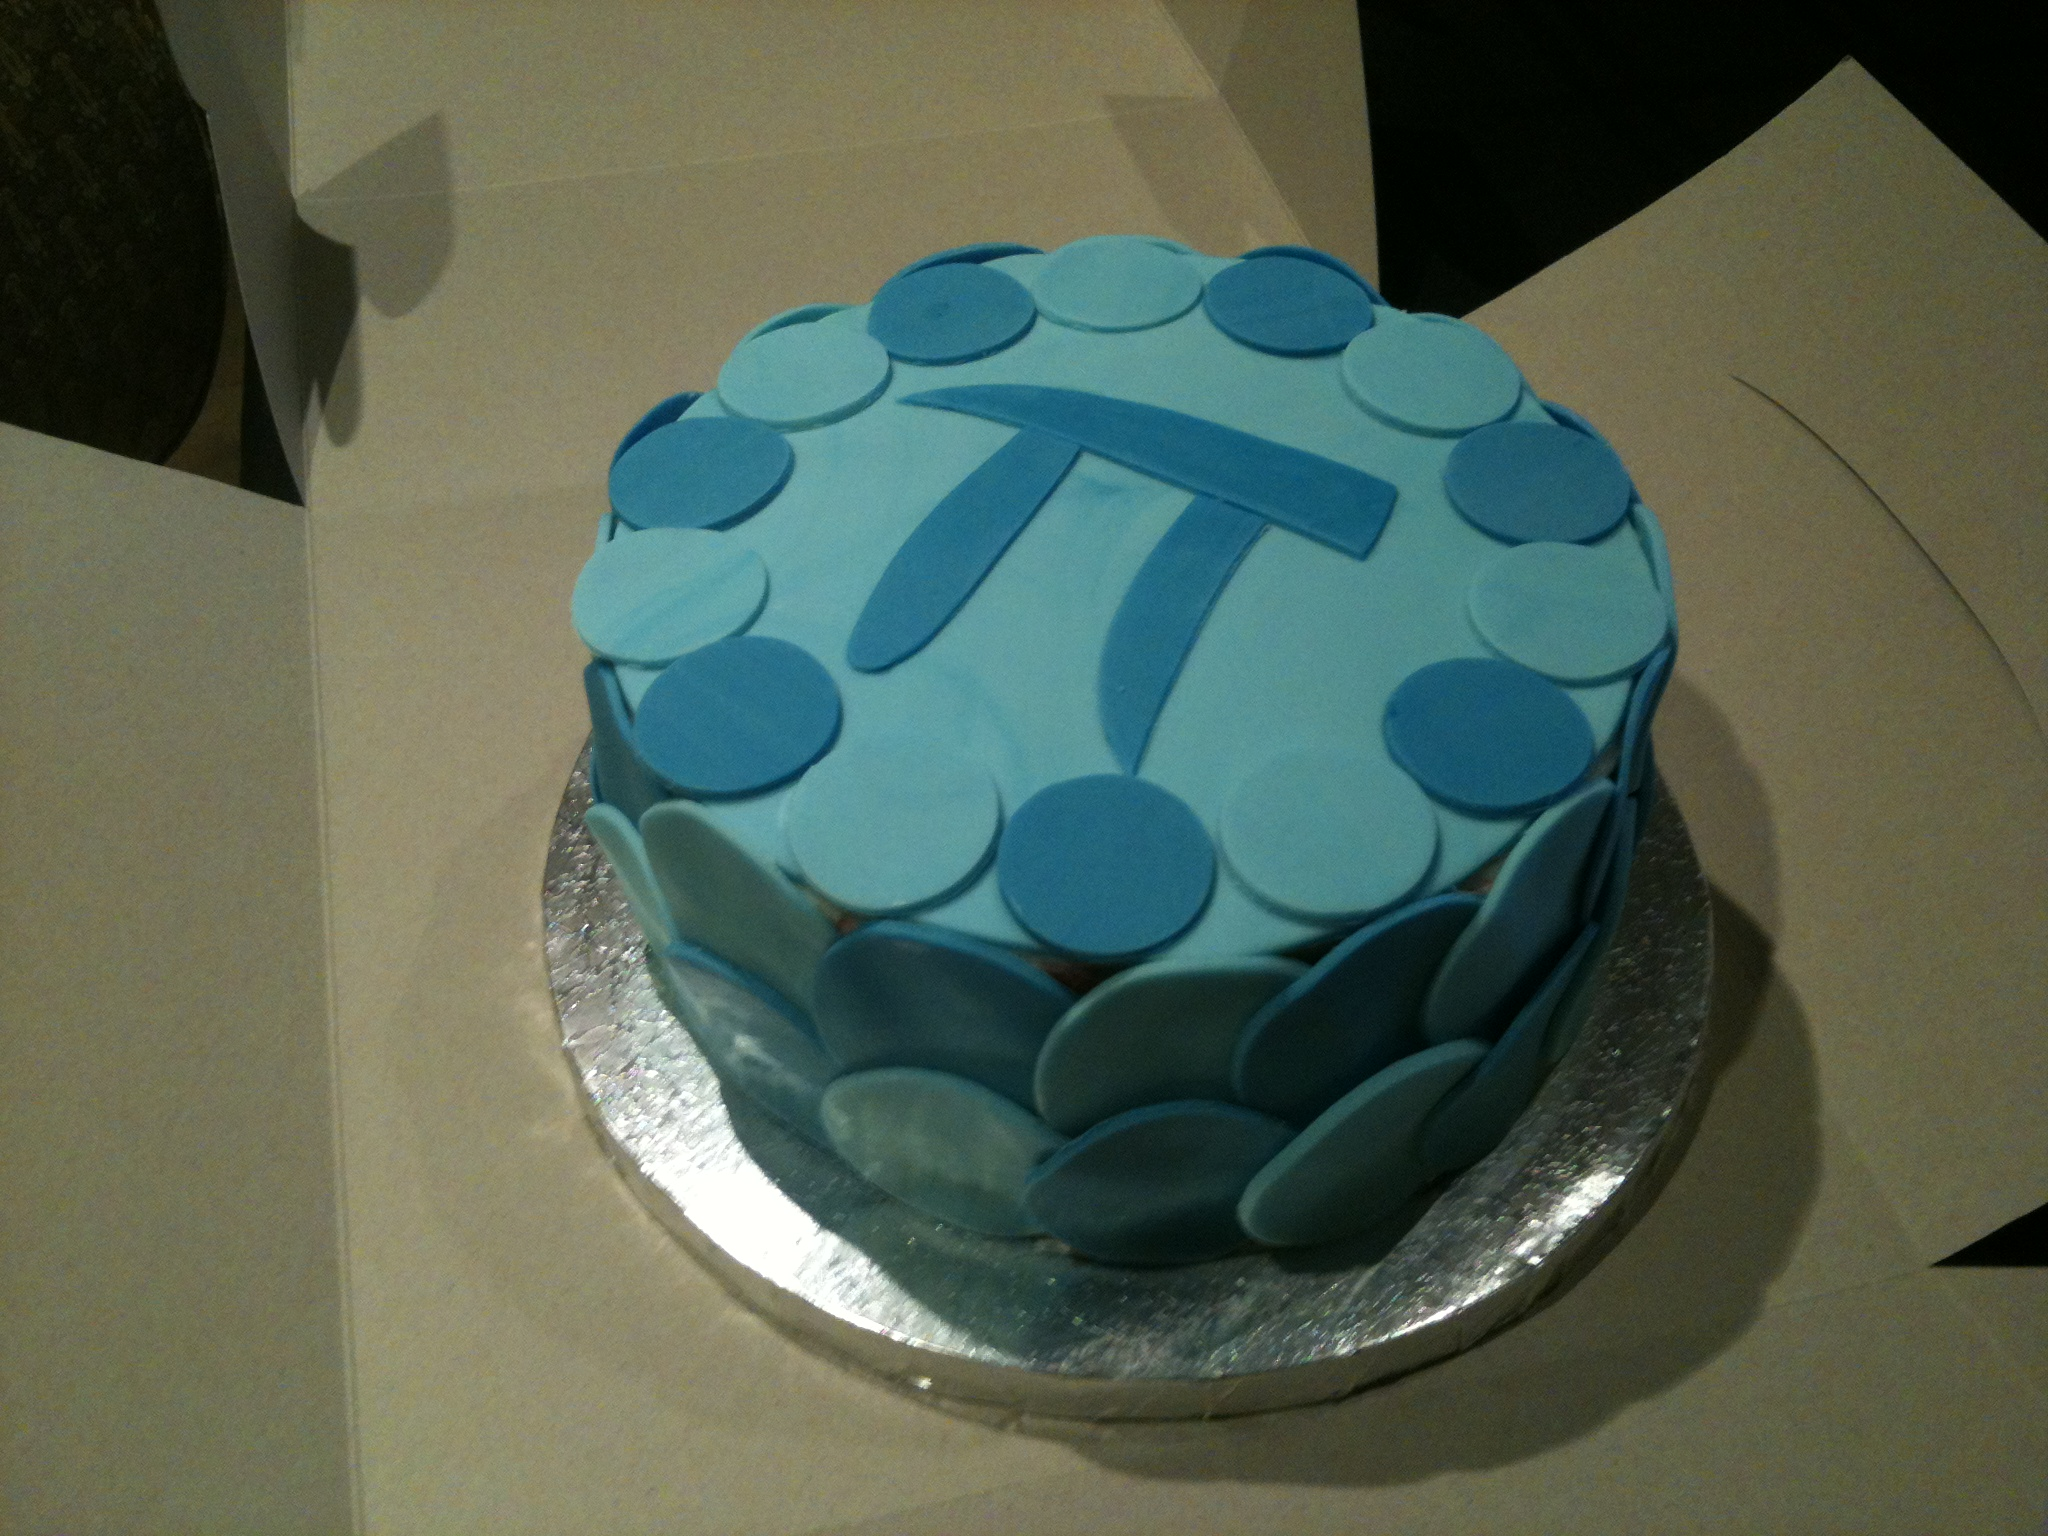 pi cake 2013